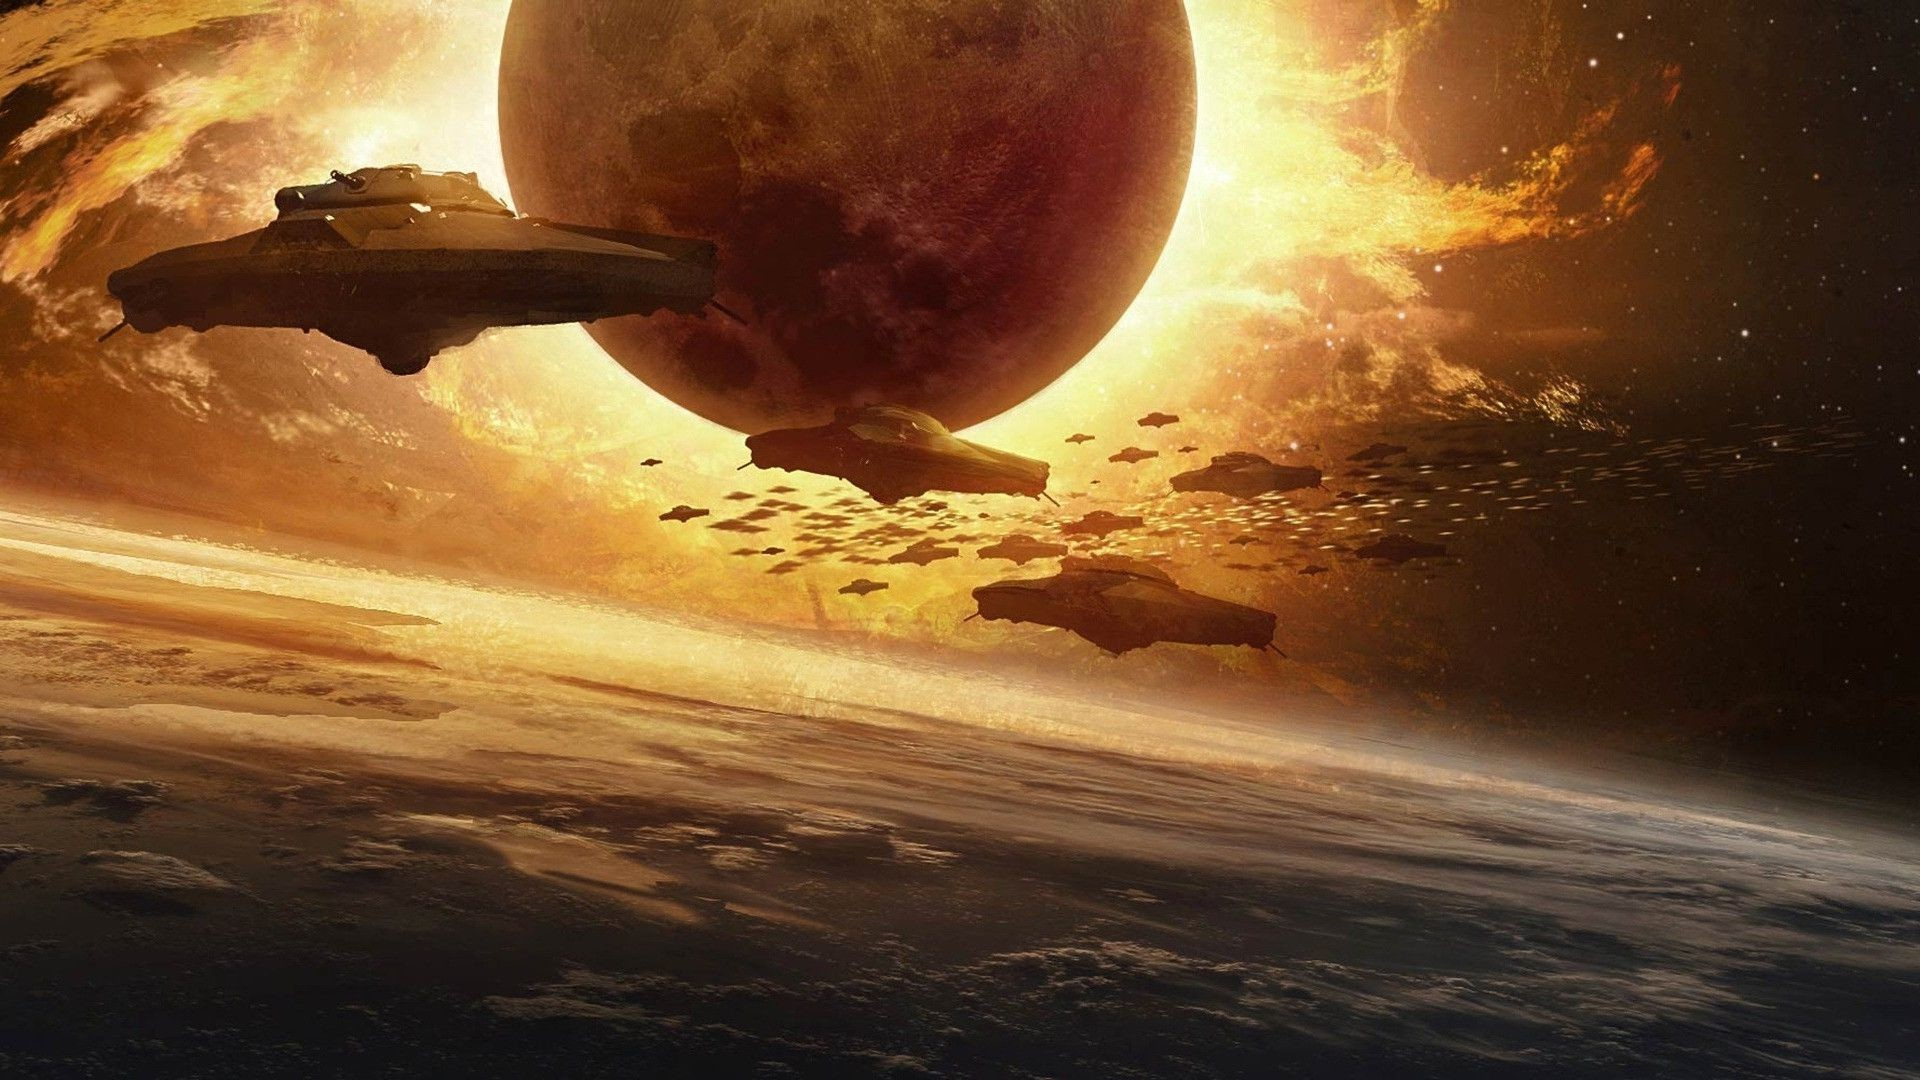 Res: 1920x1080, Alien invasion HD wallpaper